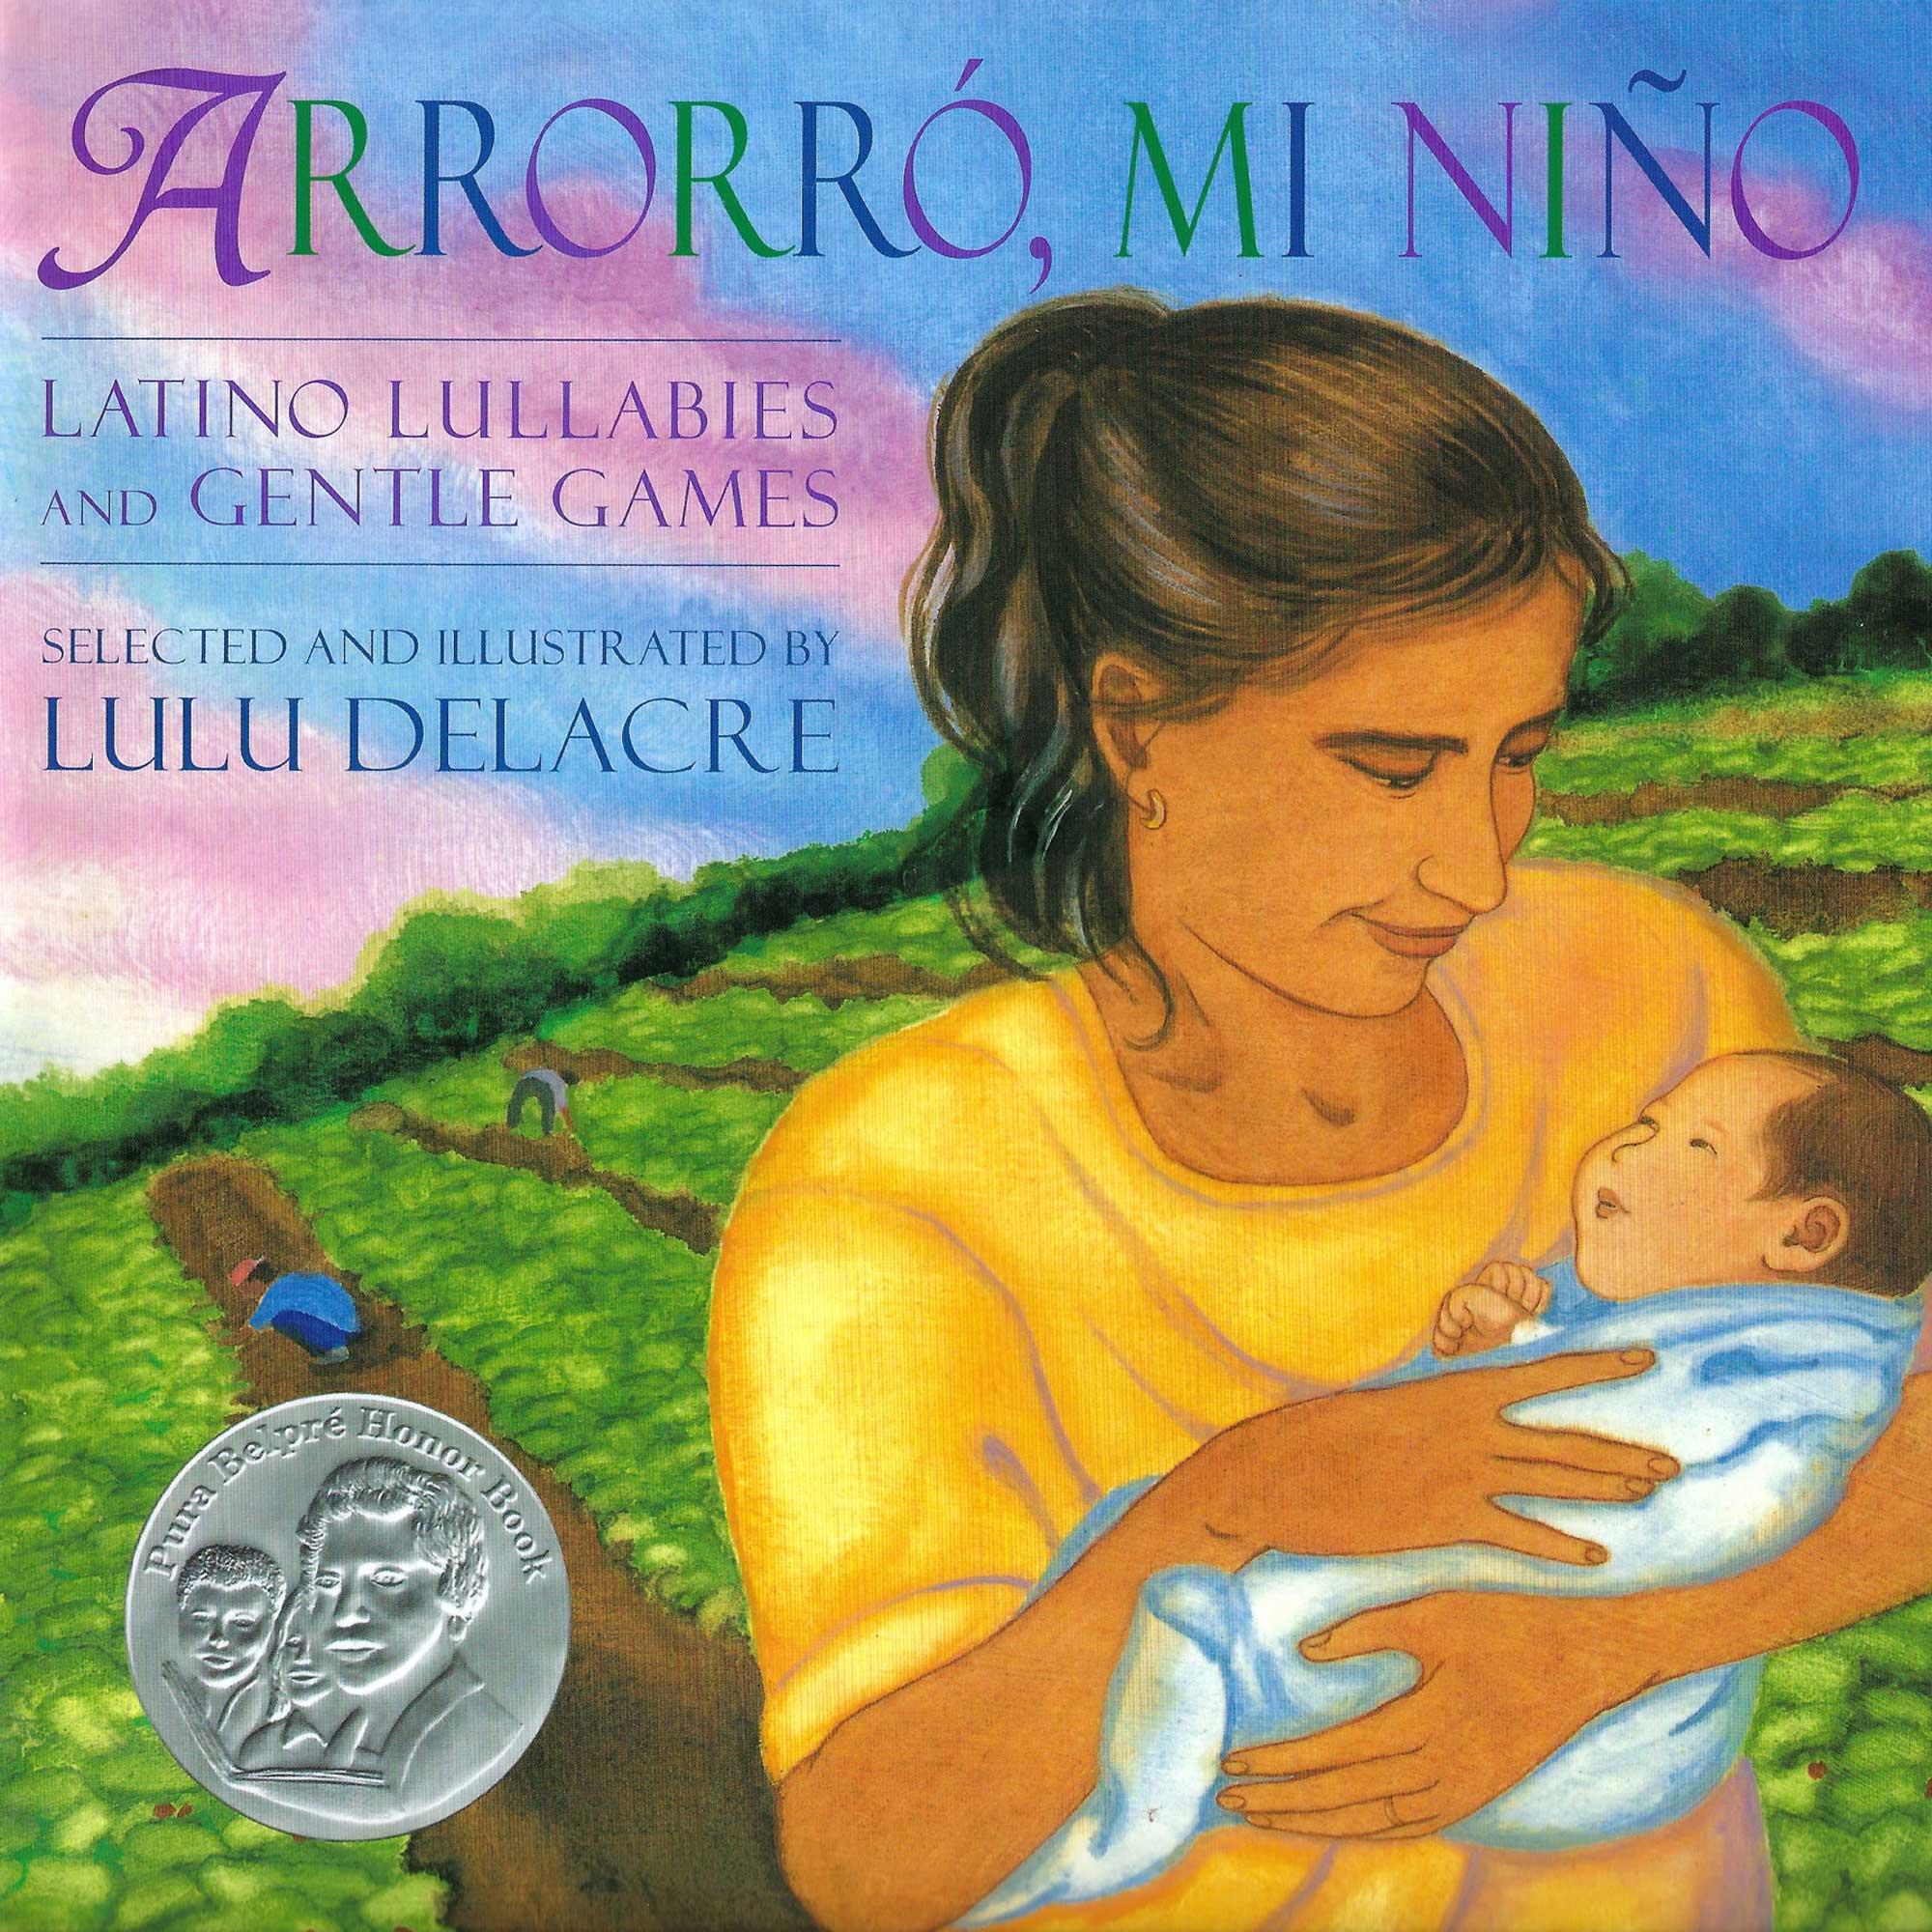 arroro mi nino lulu delacre childrens book latino lullabies and gentle games